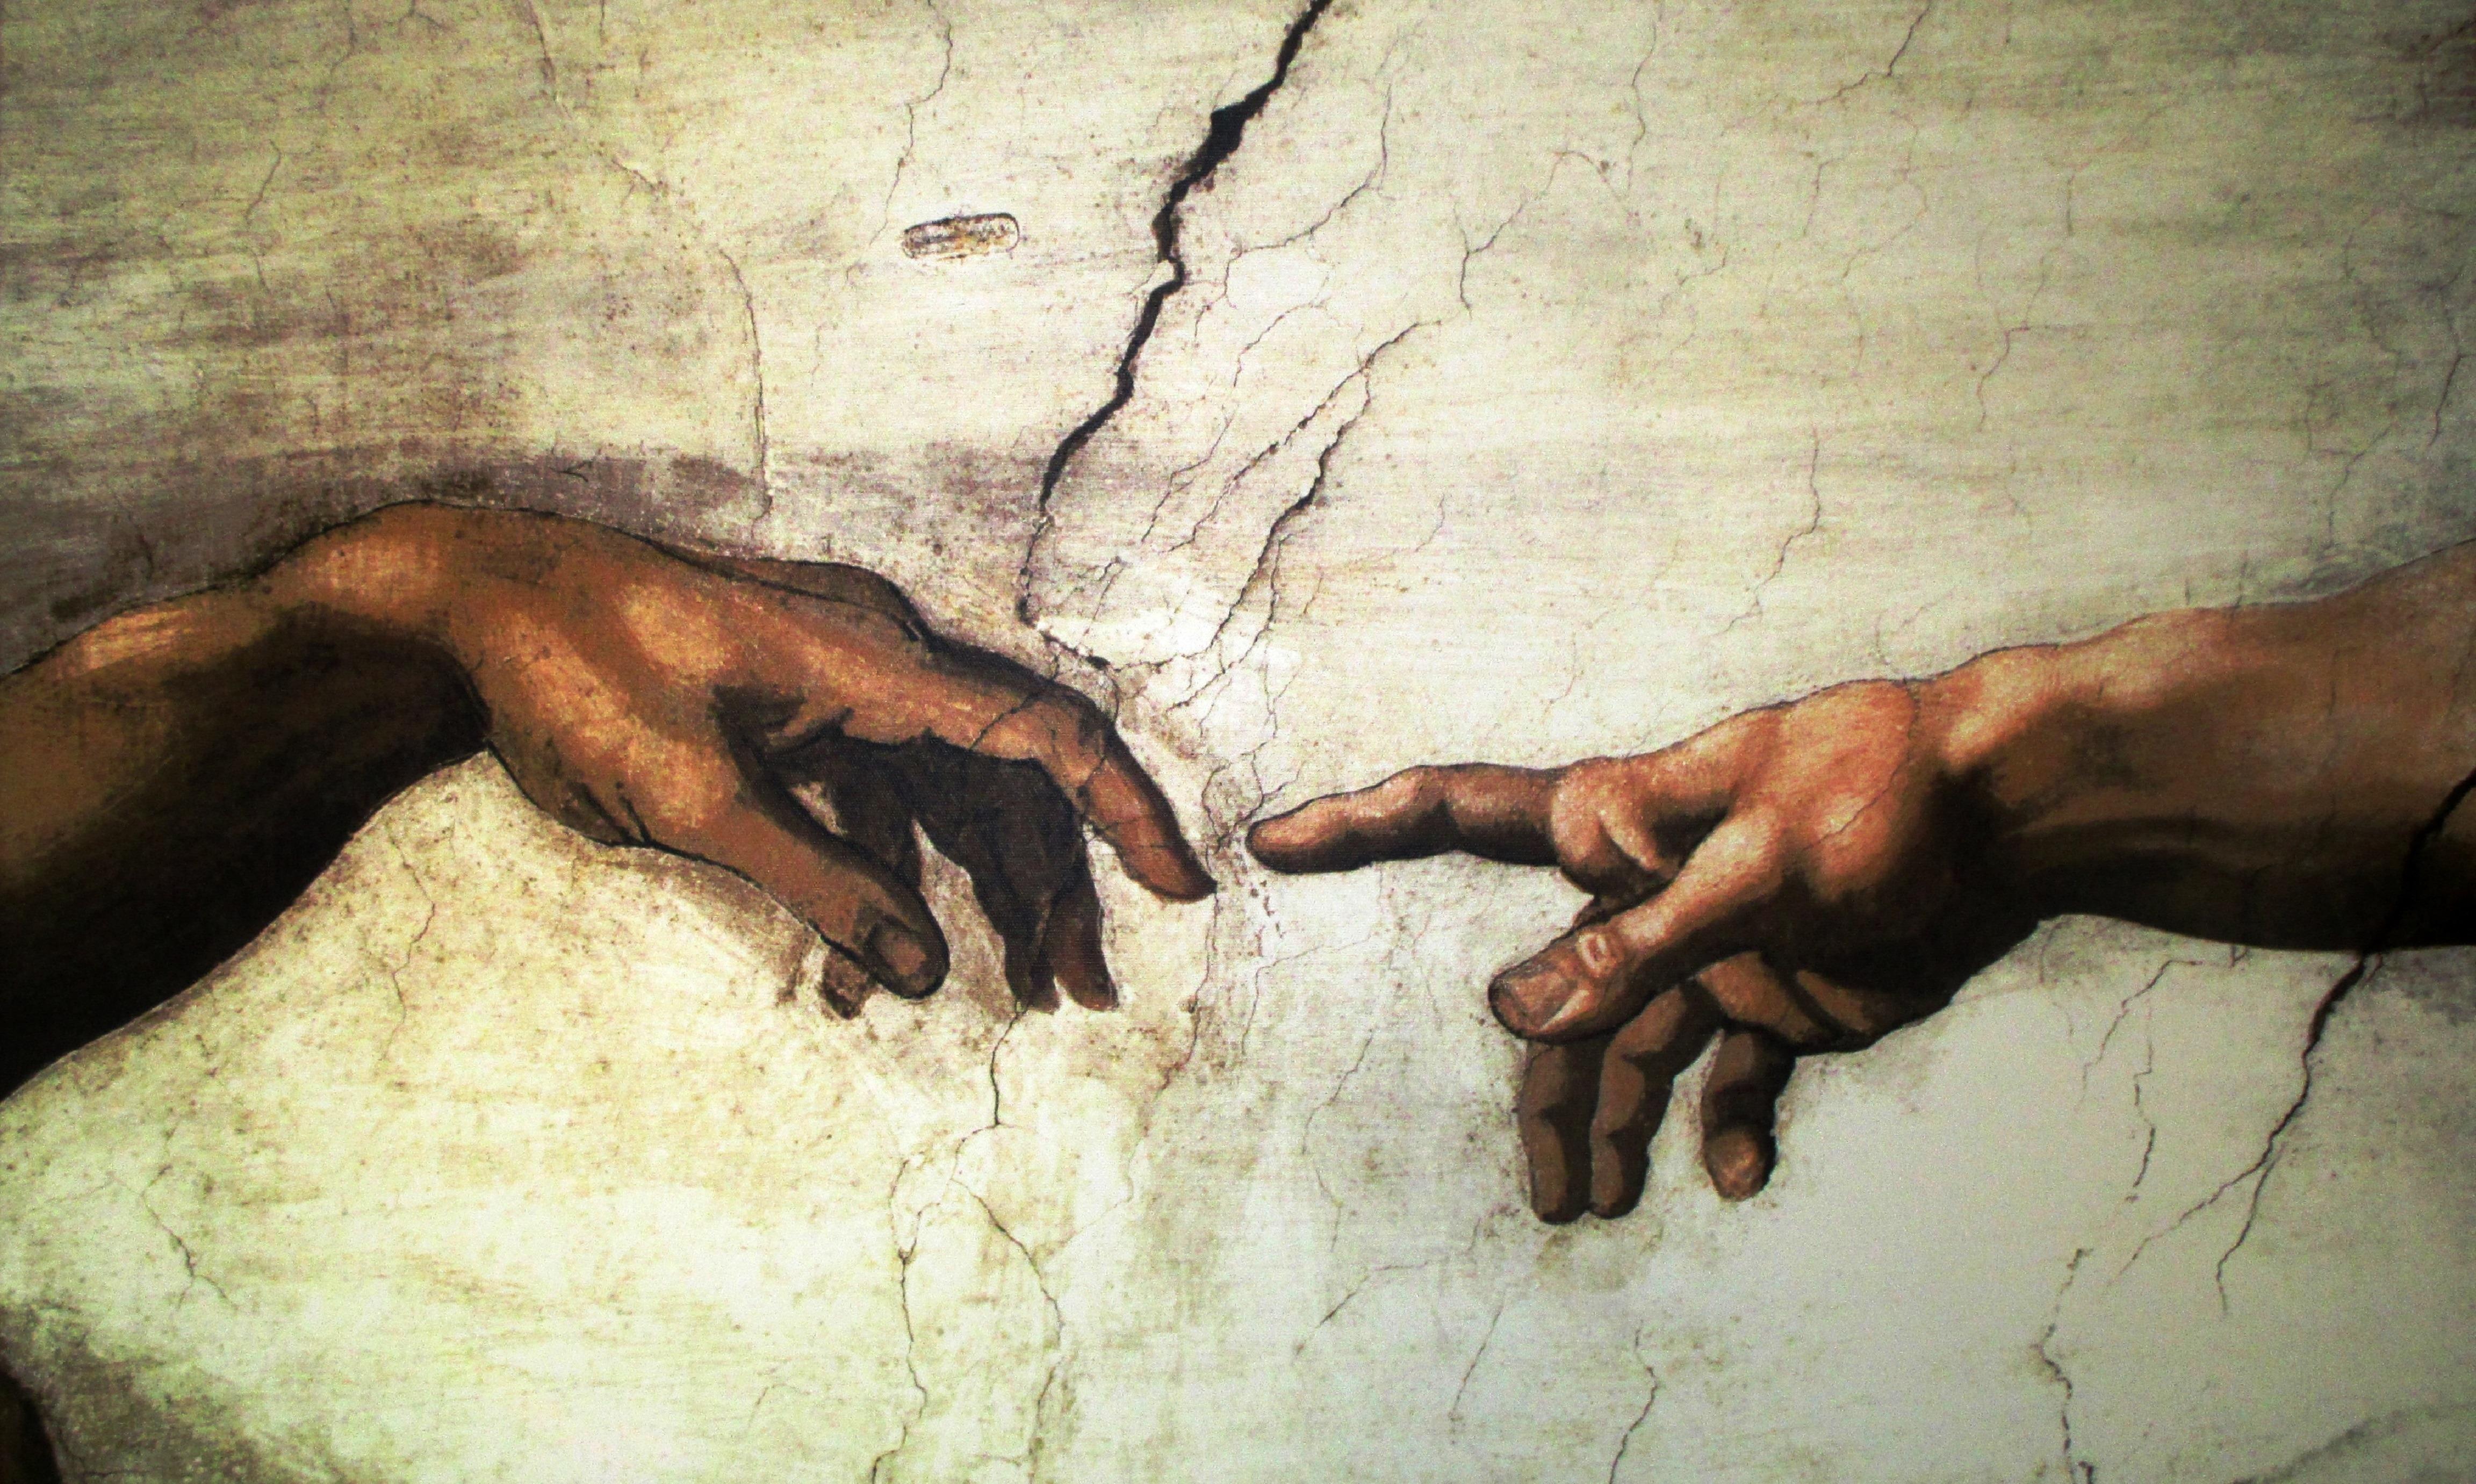 Fotos Gratis Mano Vaticano Roma Mural Michelangelo Modelo De